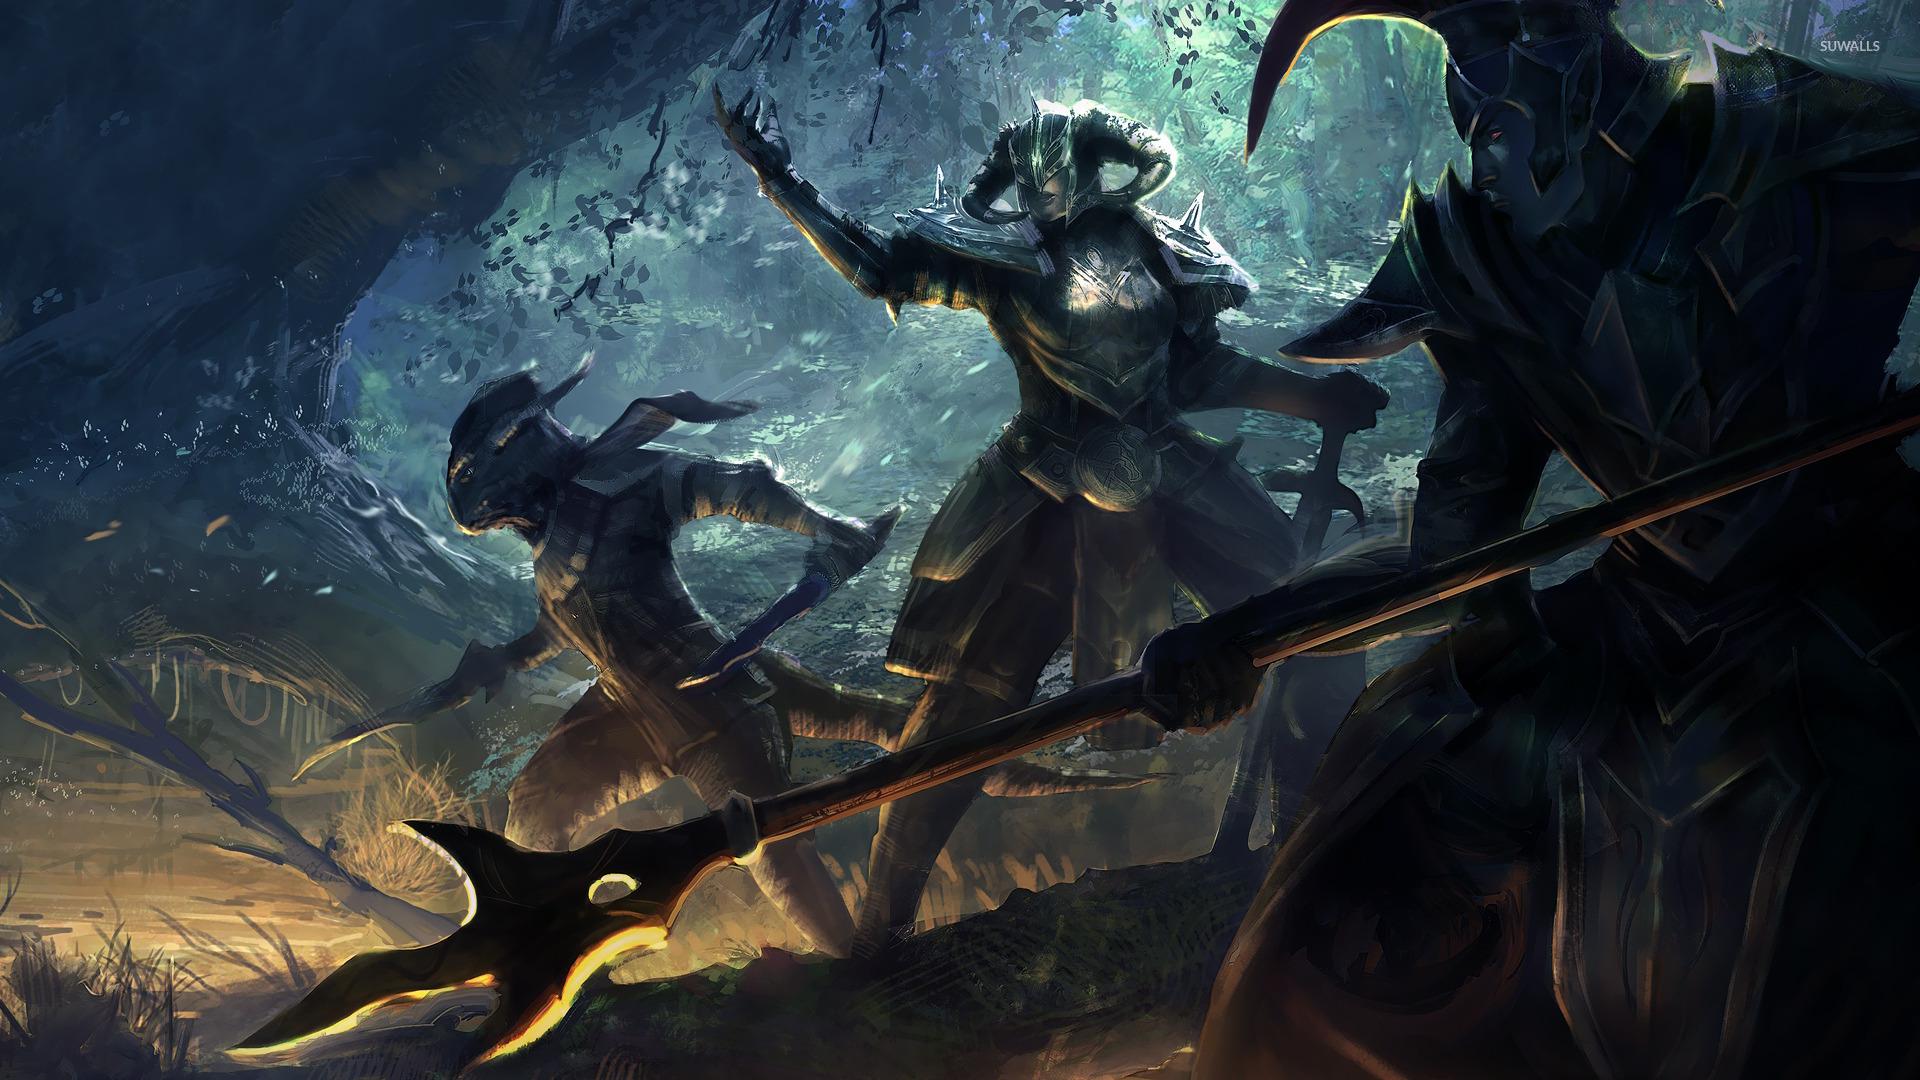 The Elder Scrolls Online Fondo De Pantalla Hd Fondo De